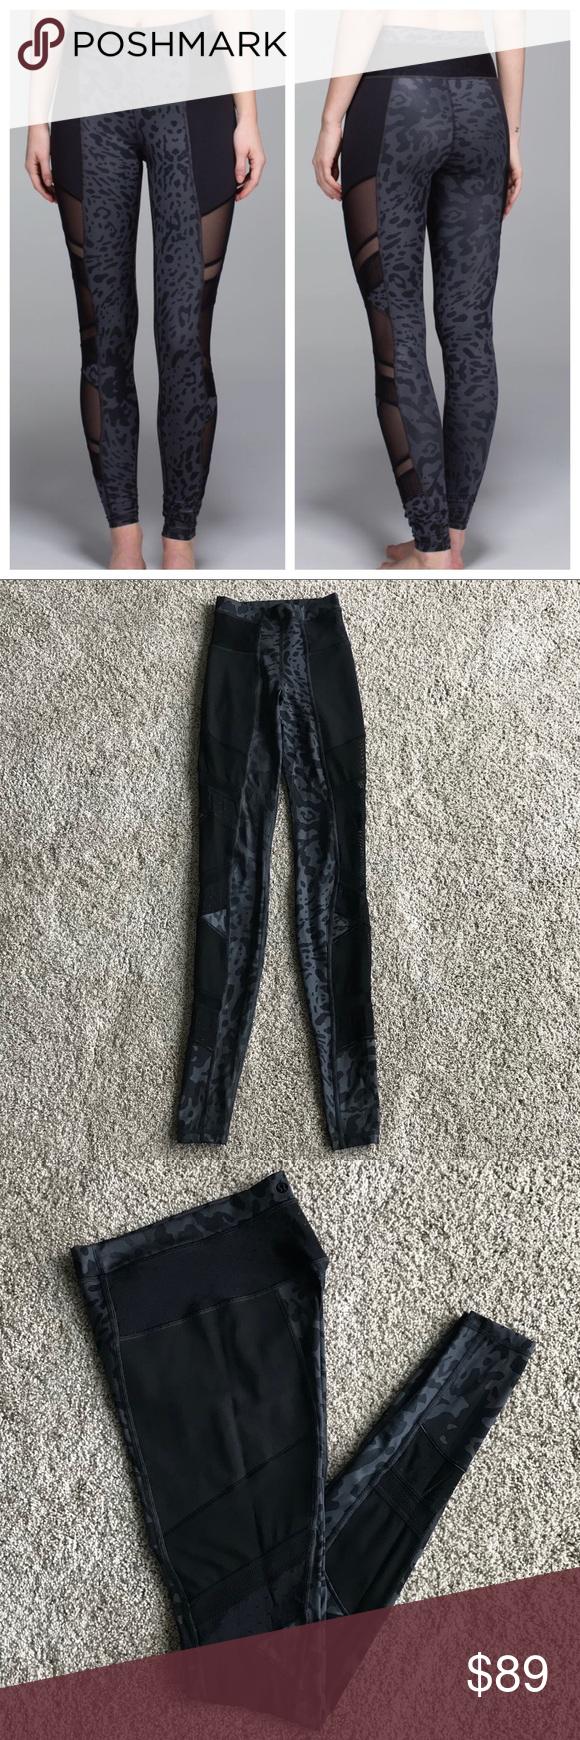 267cf34f6 Lululemon Just Breathe Pants Lululemon Just Breathe Pant Animal Swirl Deep  Coal Light   Black Size 2 -Full-On Luxtreme® fabric is sweat-wicking and  four-way ...